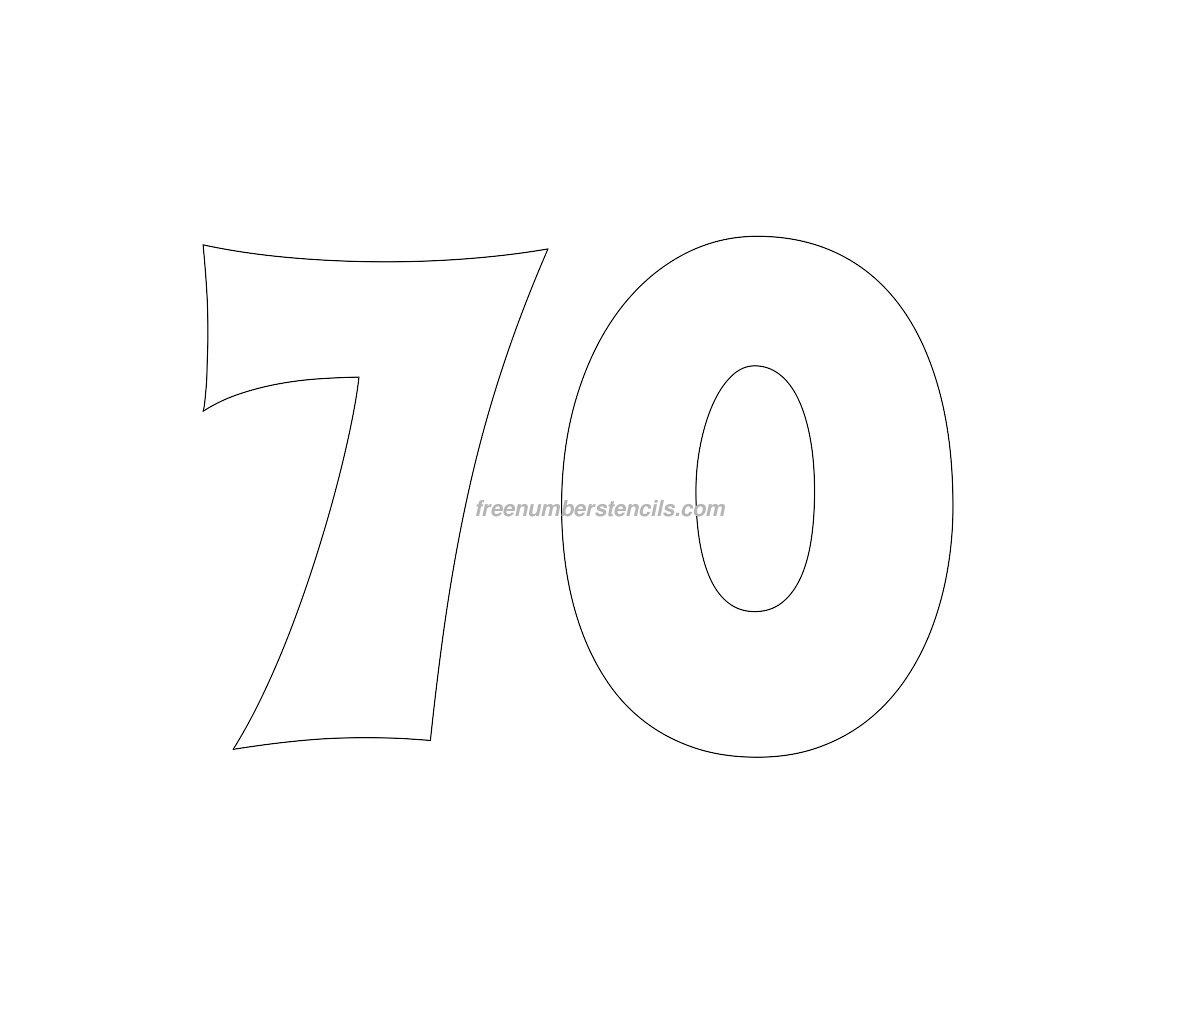 Free Groovy 70 Number Stencil Freenumberstencils